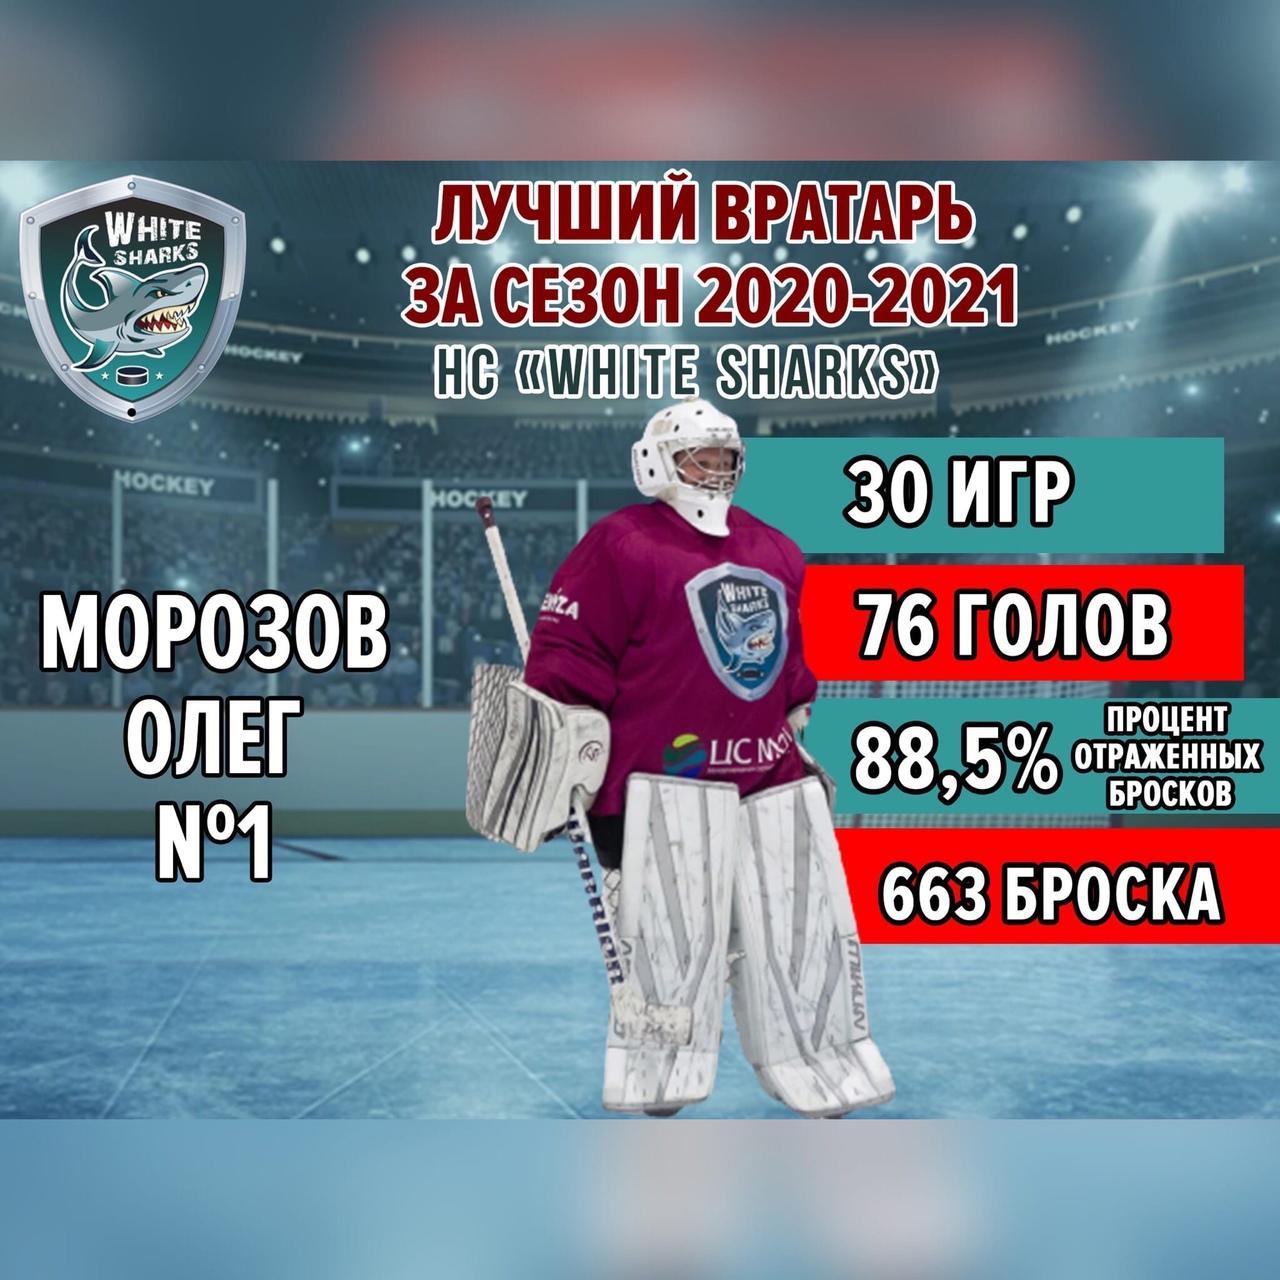 Лучшие вратари White Sharks сезон 2020/21